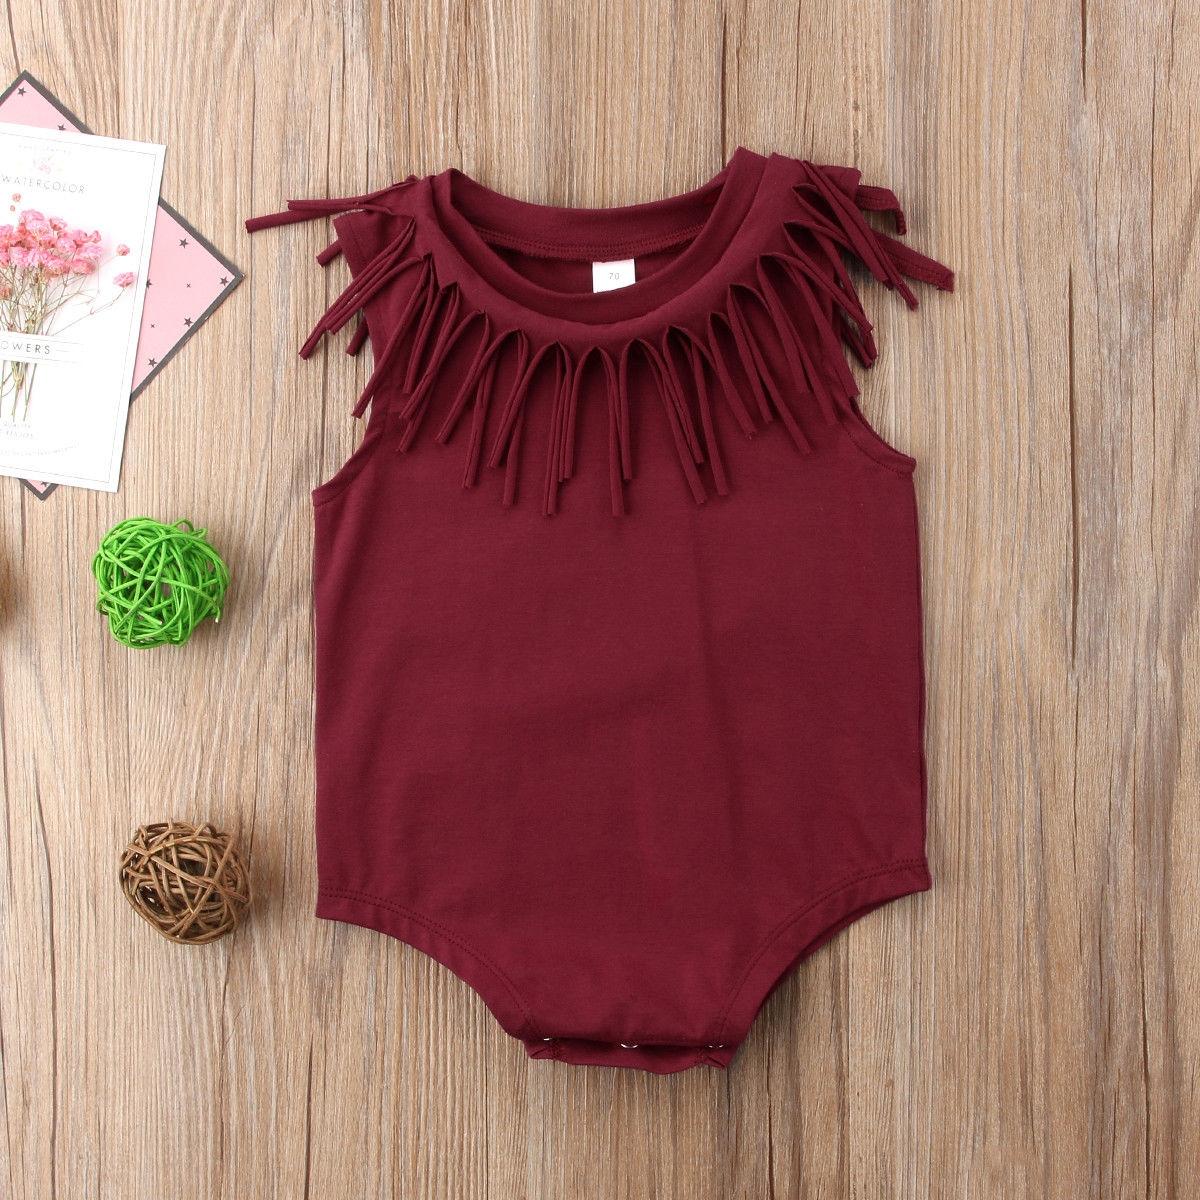 9920a69cf58 Newborn Infant Baby Girls Boy Romper Bodysuit Jumpsuit Outfits ...